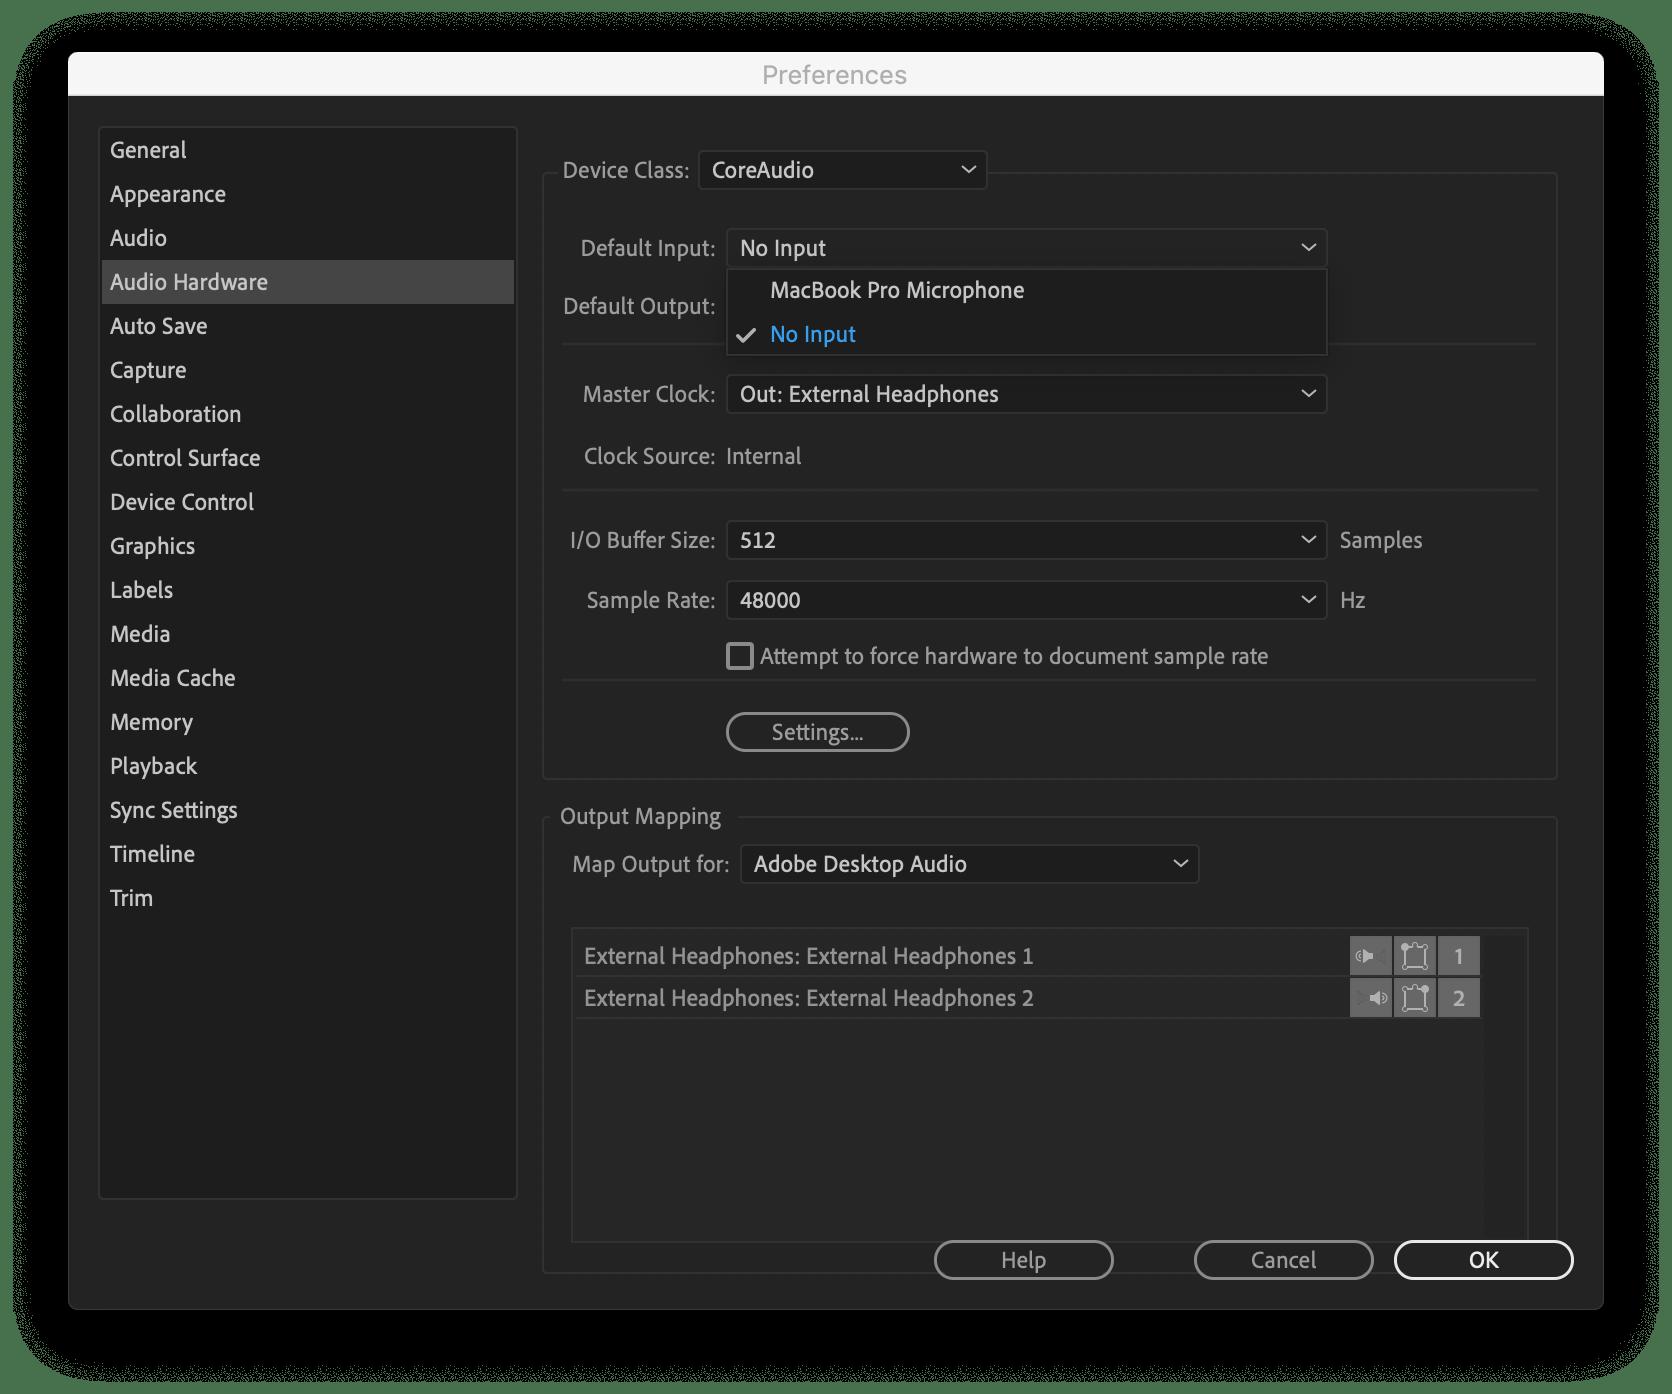 تغيير تفضيلات Adobe Premiere CC لمنع انفجار مكبرات صوت Mac